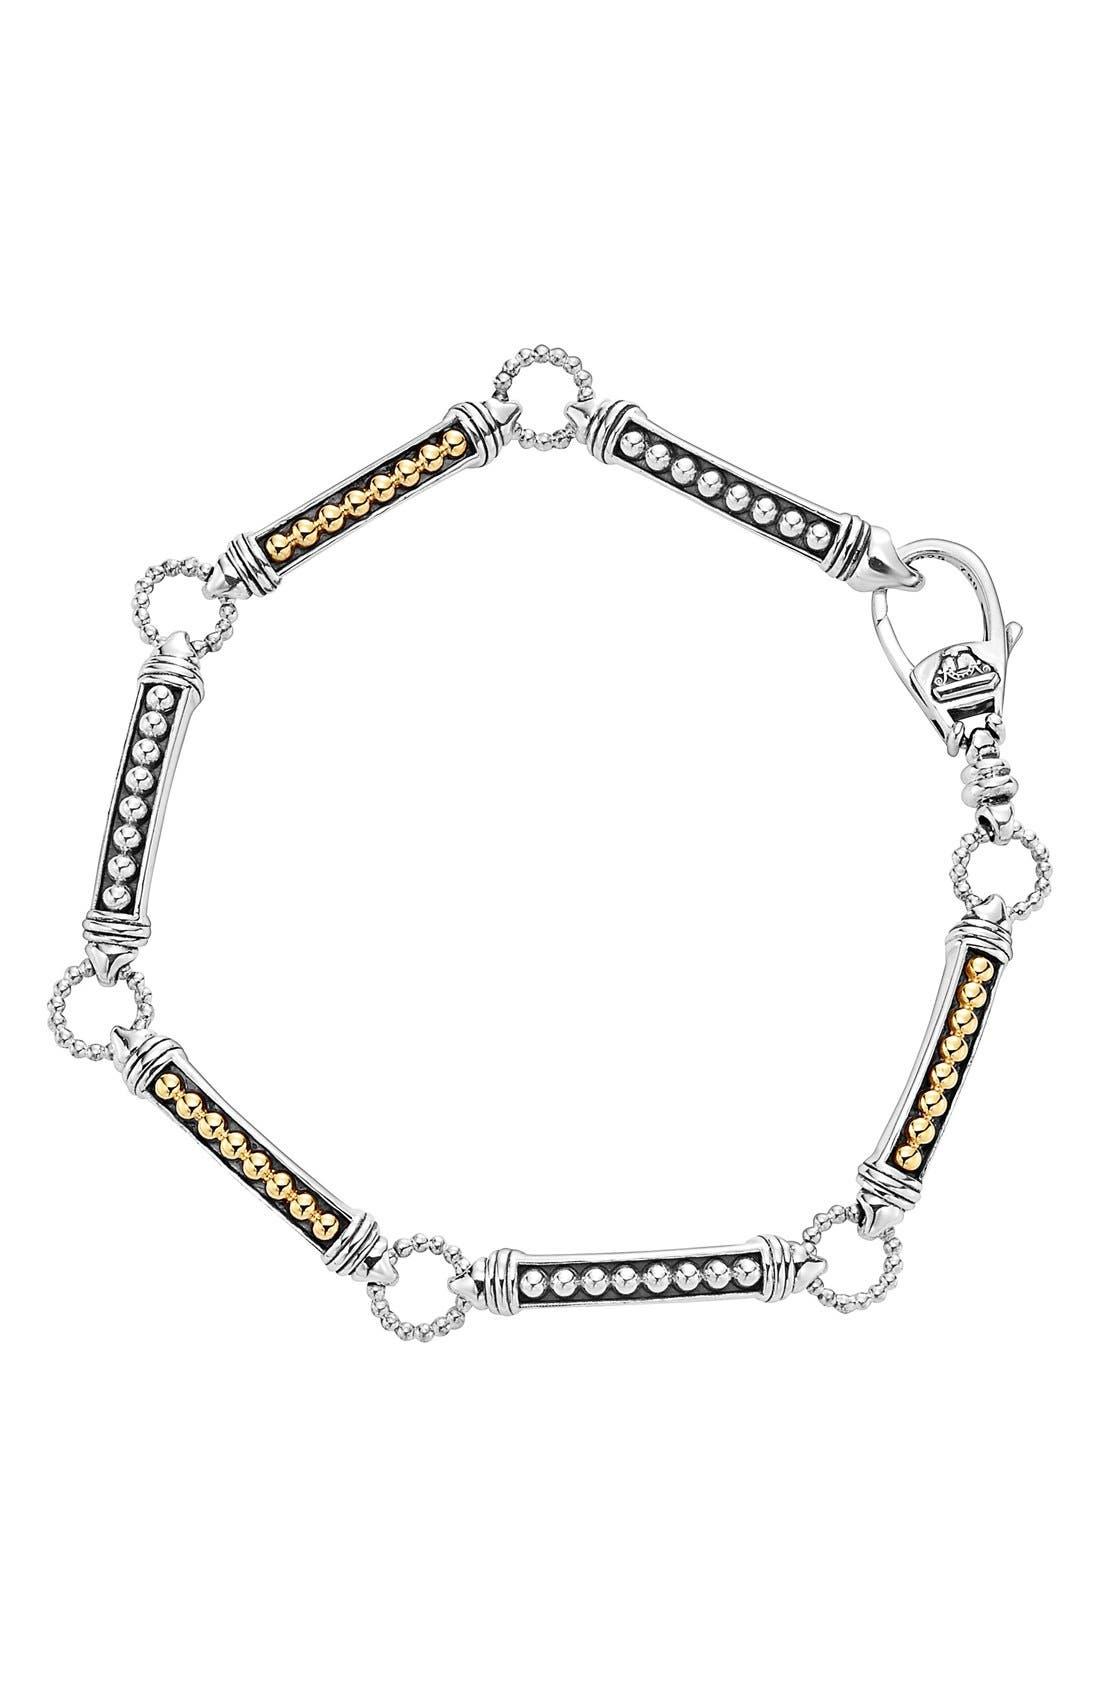 LAGOS Caviar 'Superfine' Two-Tone Line Bracelet